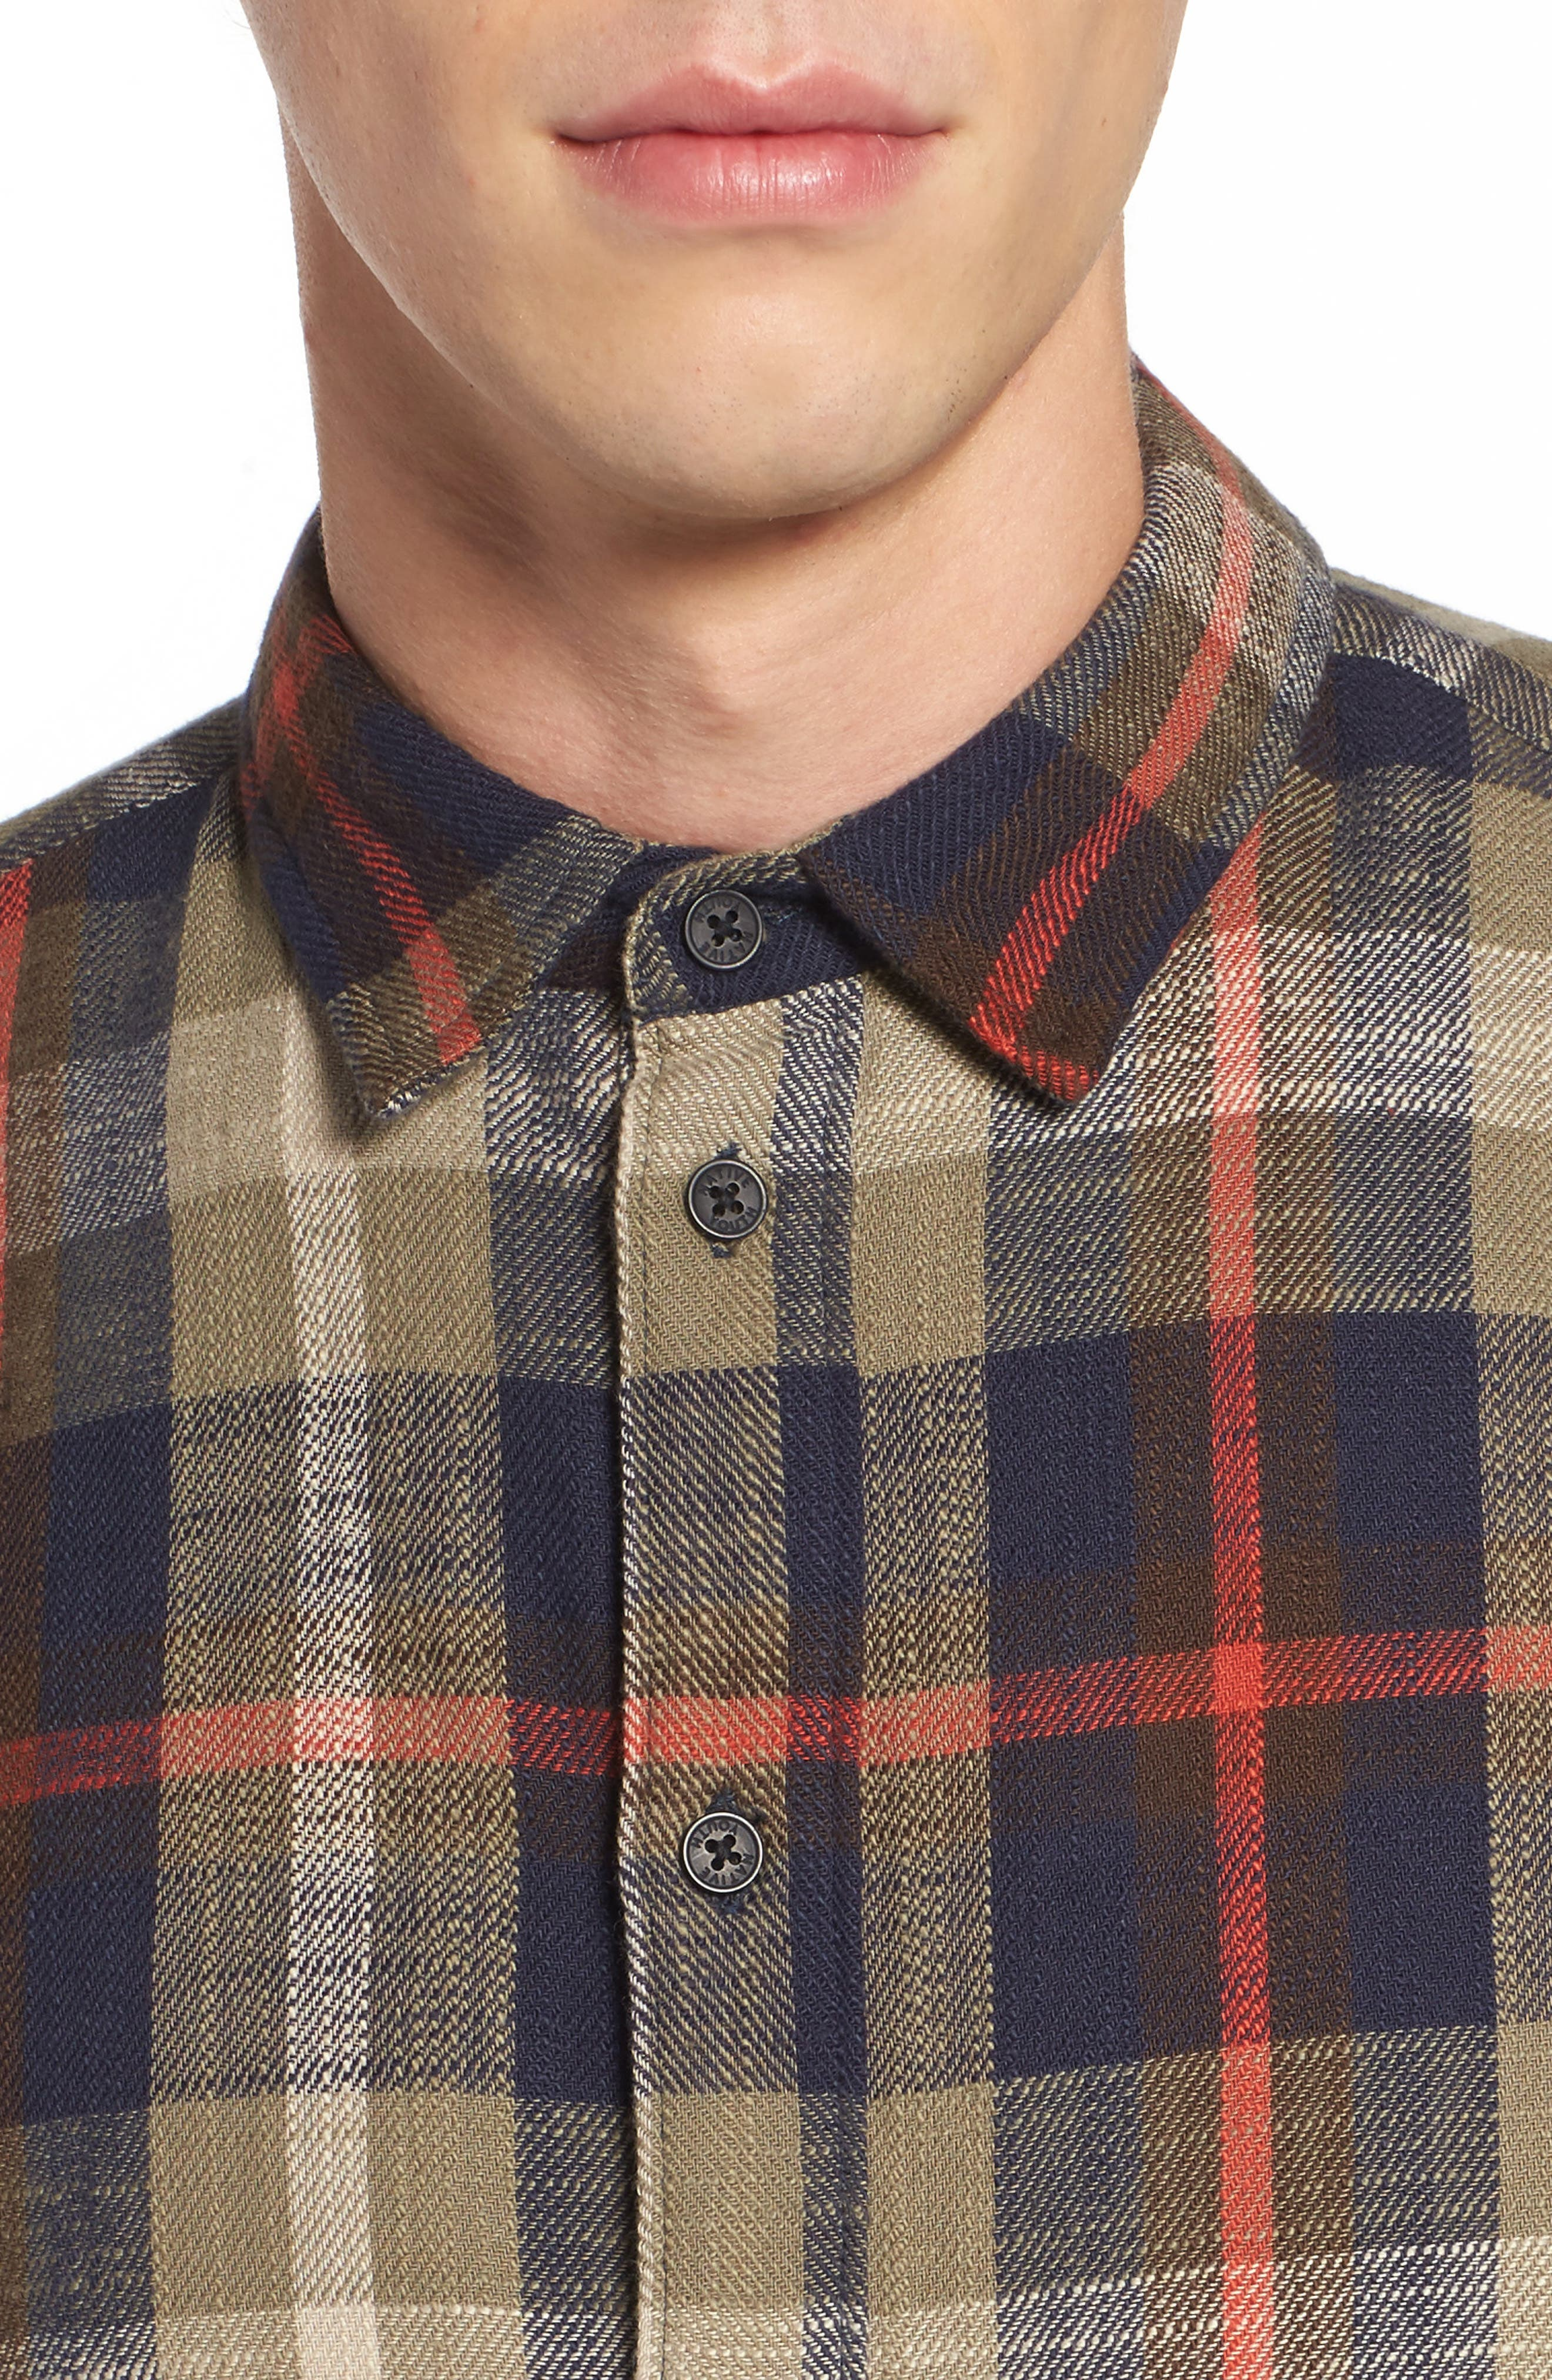 Brae Plaid Flannel Shirt,                             Alternate thumbnail 4, color,                             300